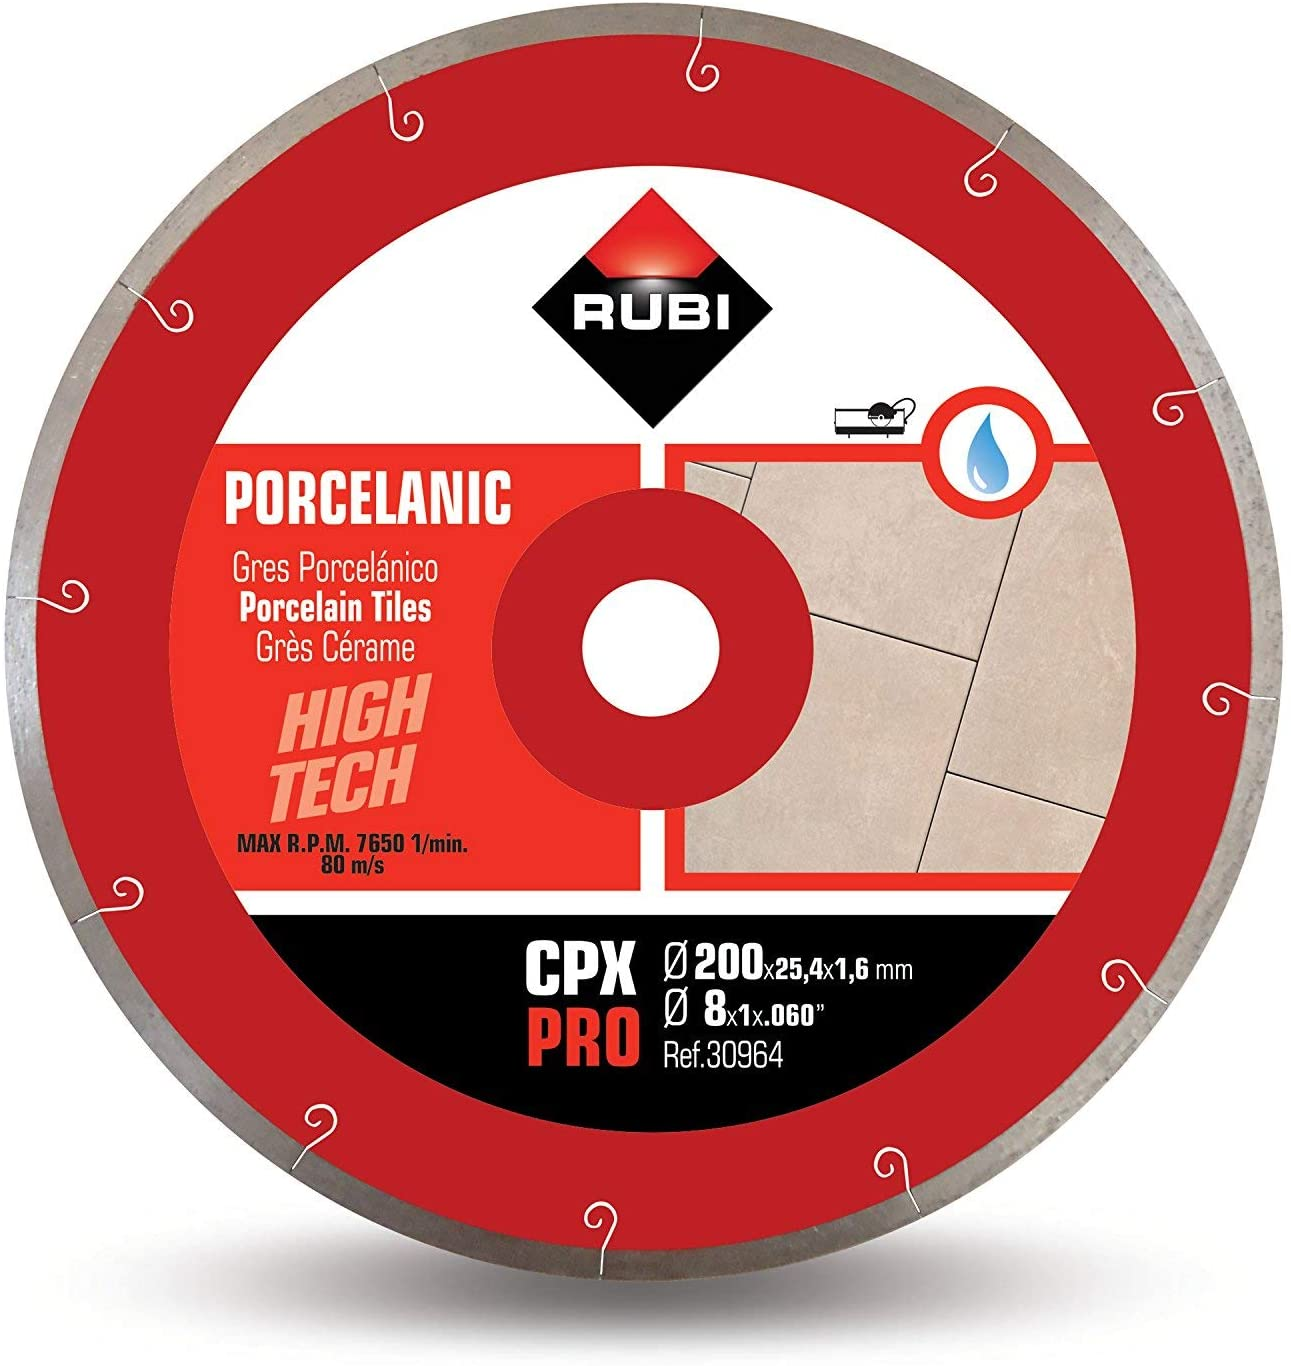 Rubi 30962 - 10″ Porcelain Tiles J-Slot Diamond Blade, CPX-250 PRO